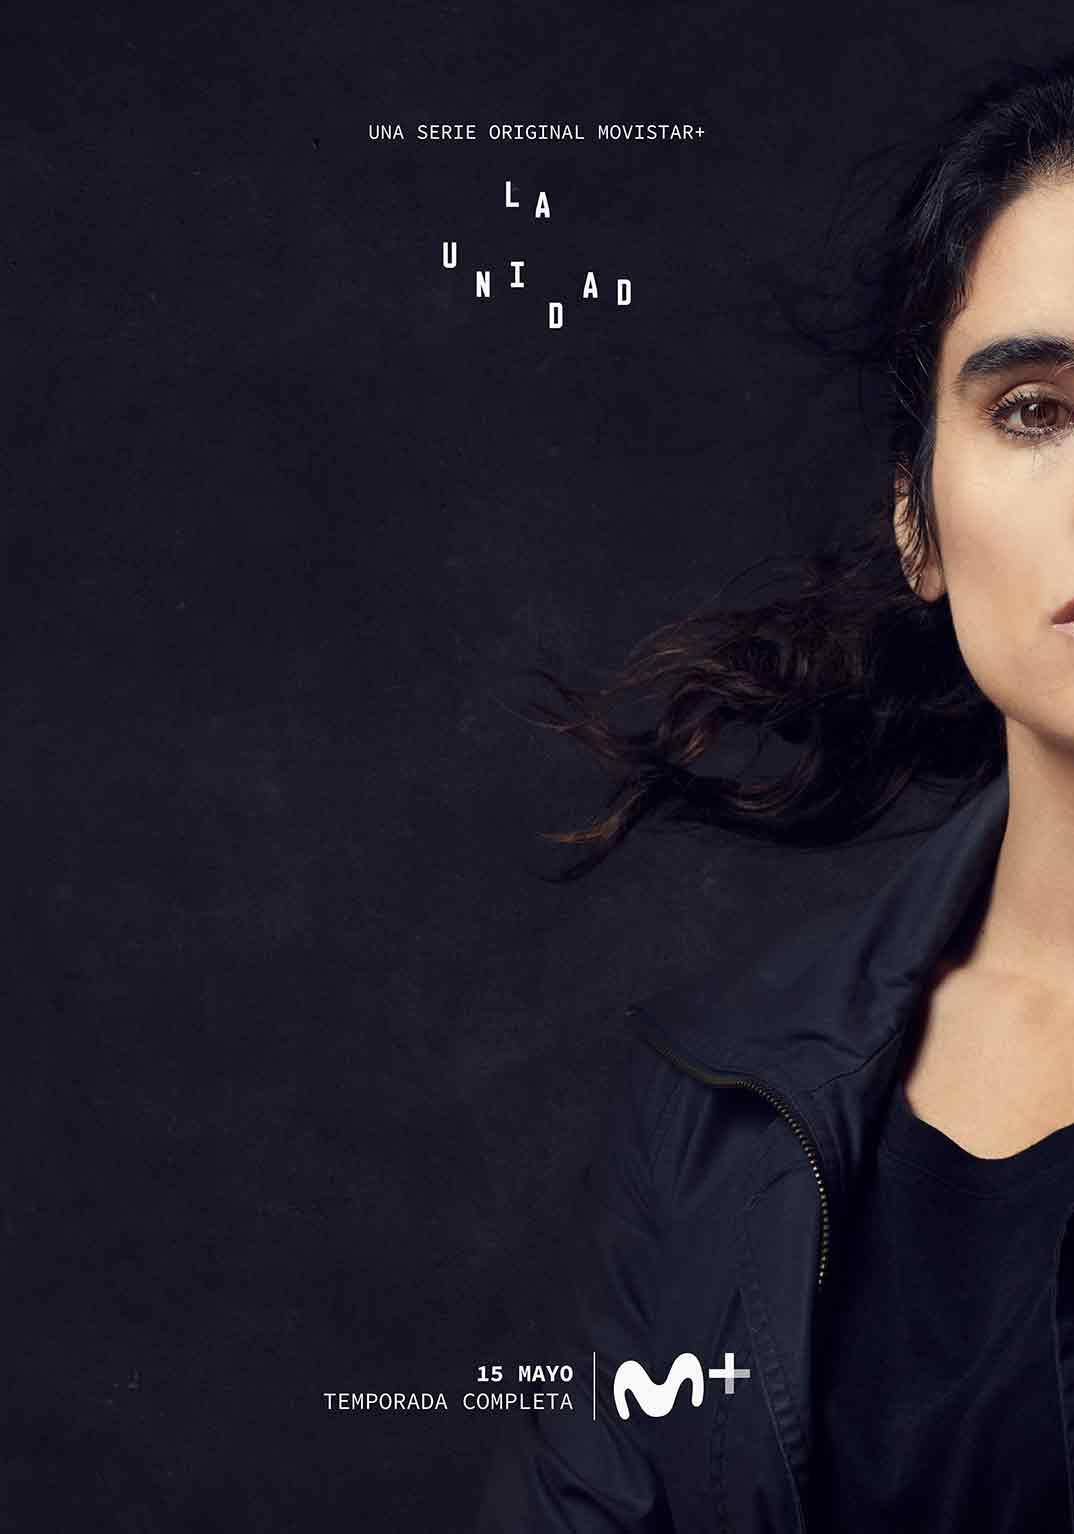 Fariba Sheikhan - La unidad © Movistar+